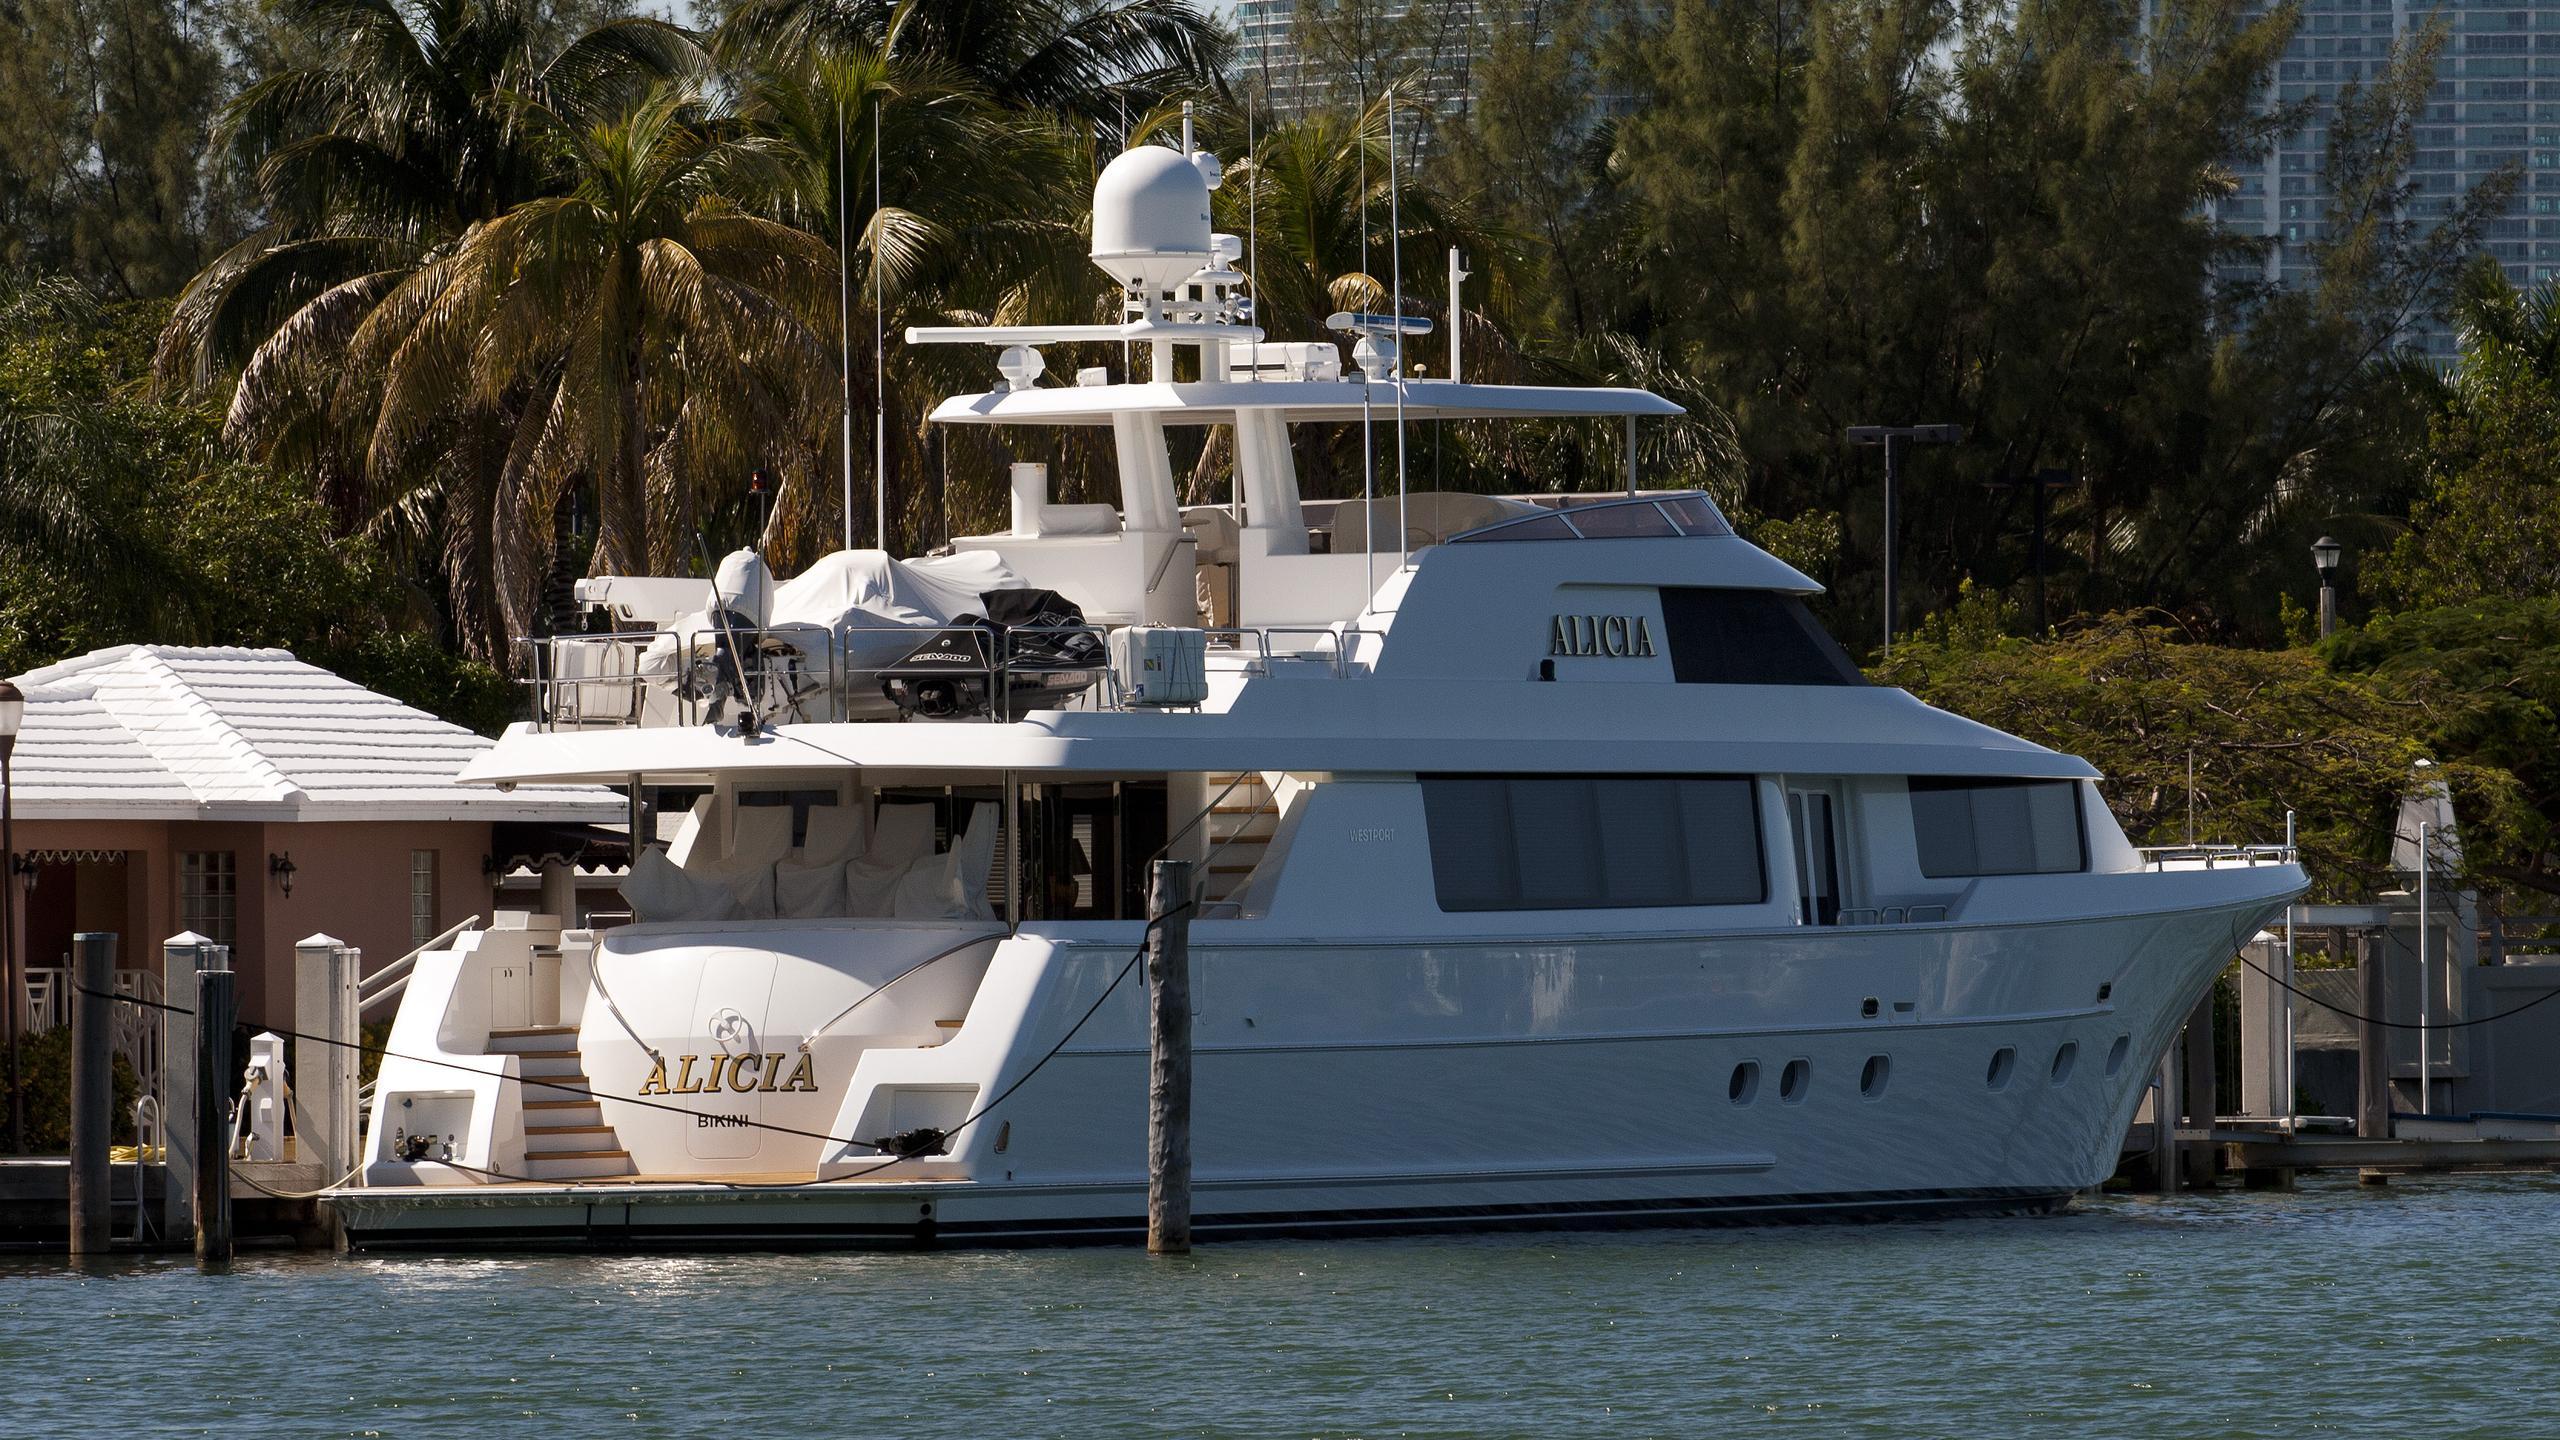 alicia-yacht-exterior